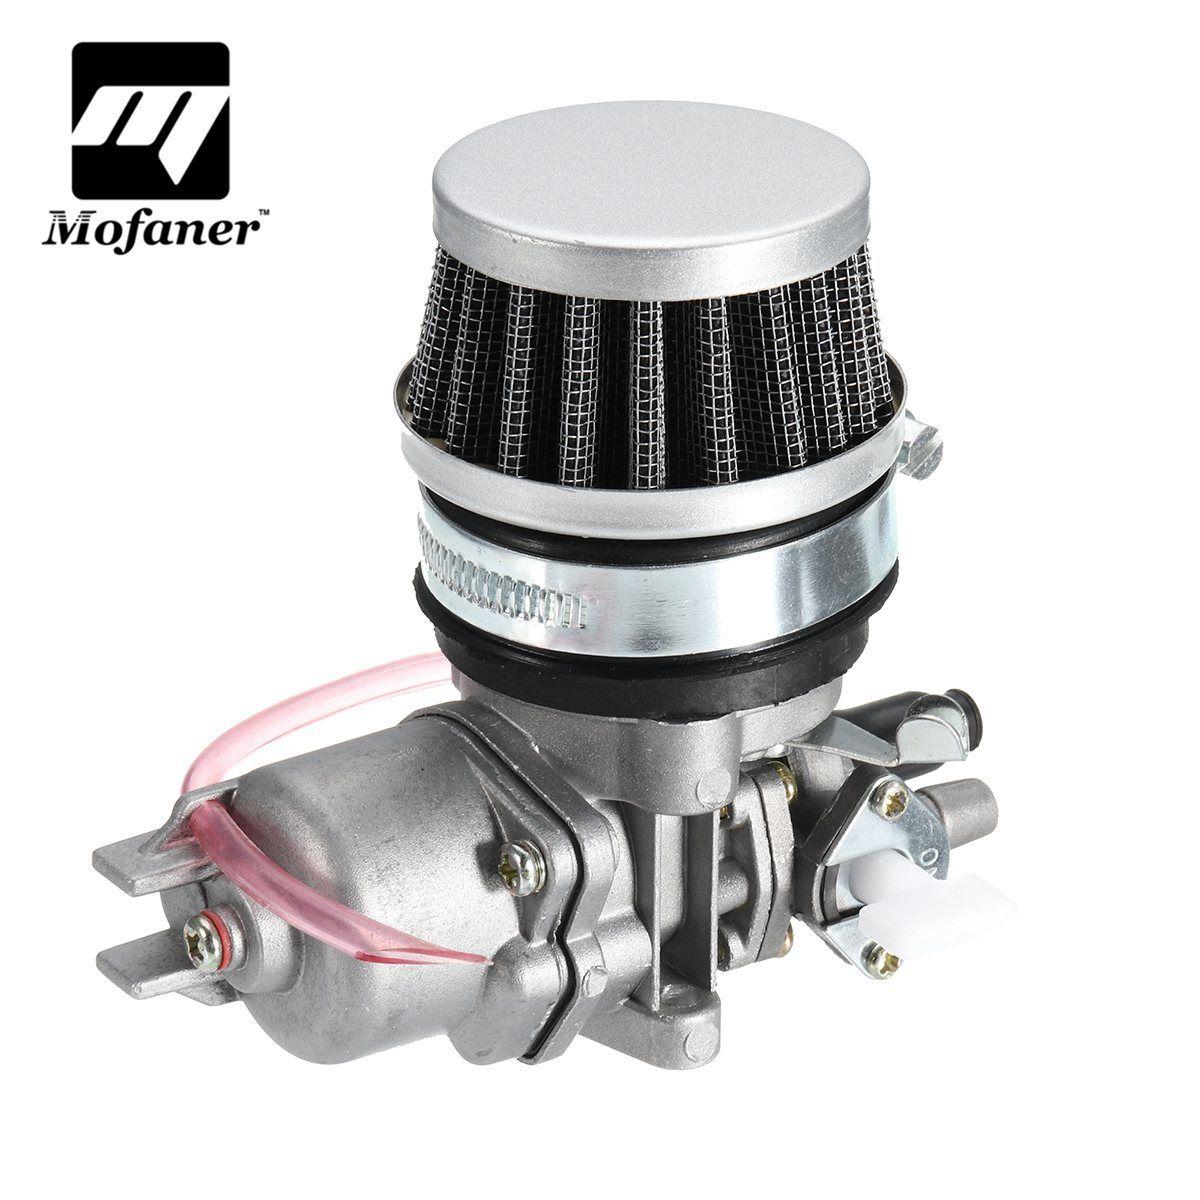 1Set Metal Motorcycle Carburettor Carb Air Filter Set For 47cc 49cc Mini Moto Pit Dirt Bike Go Kart